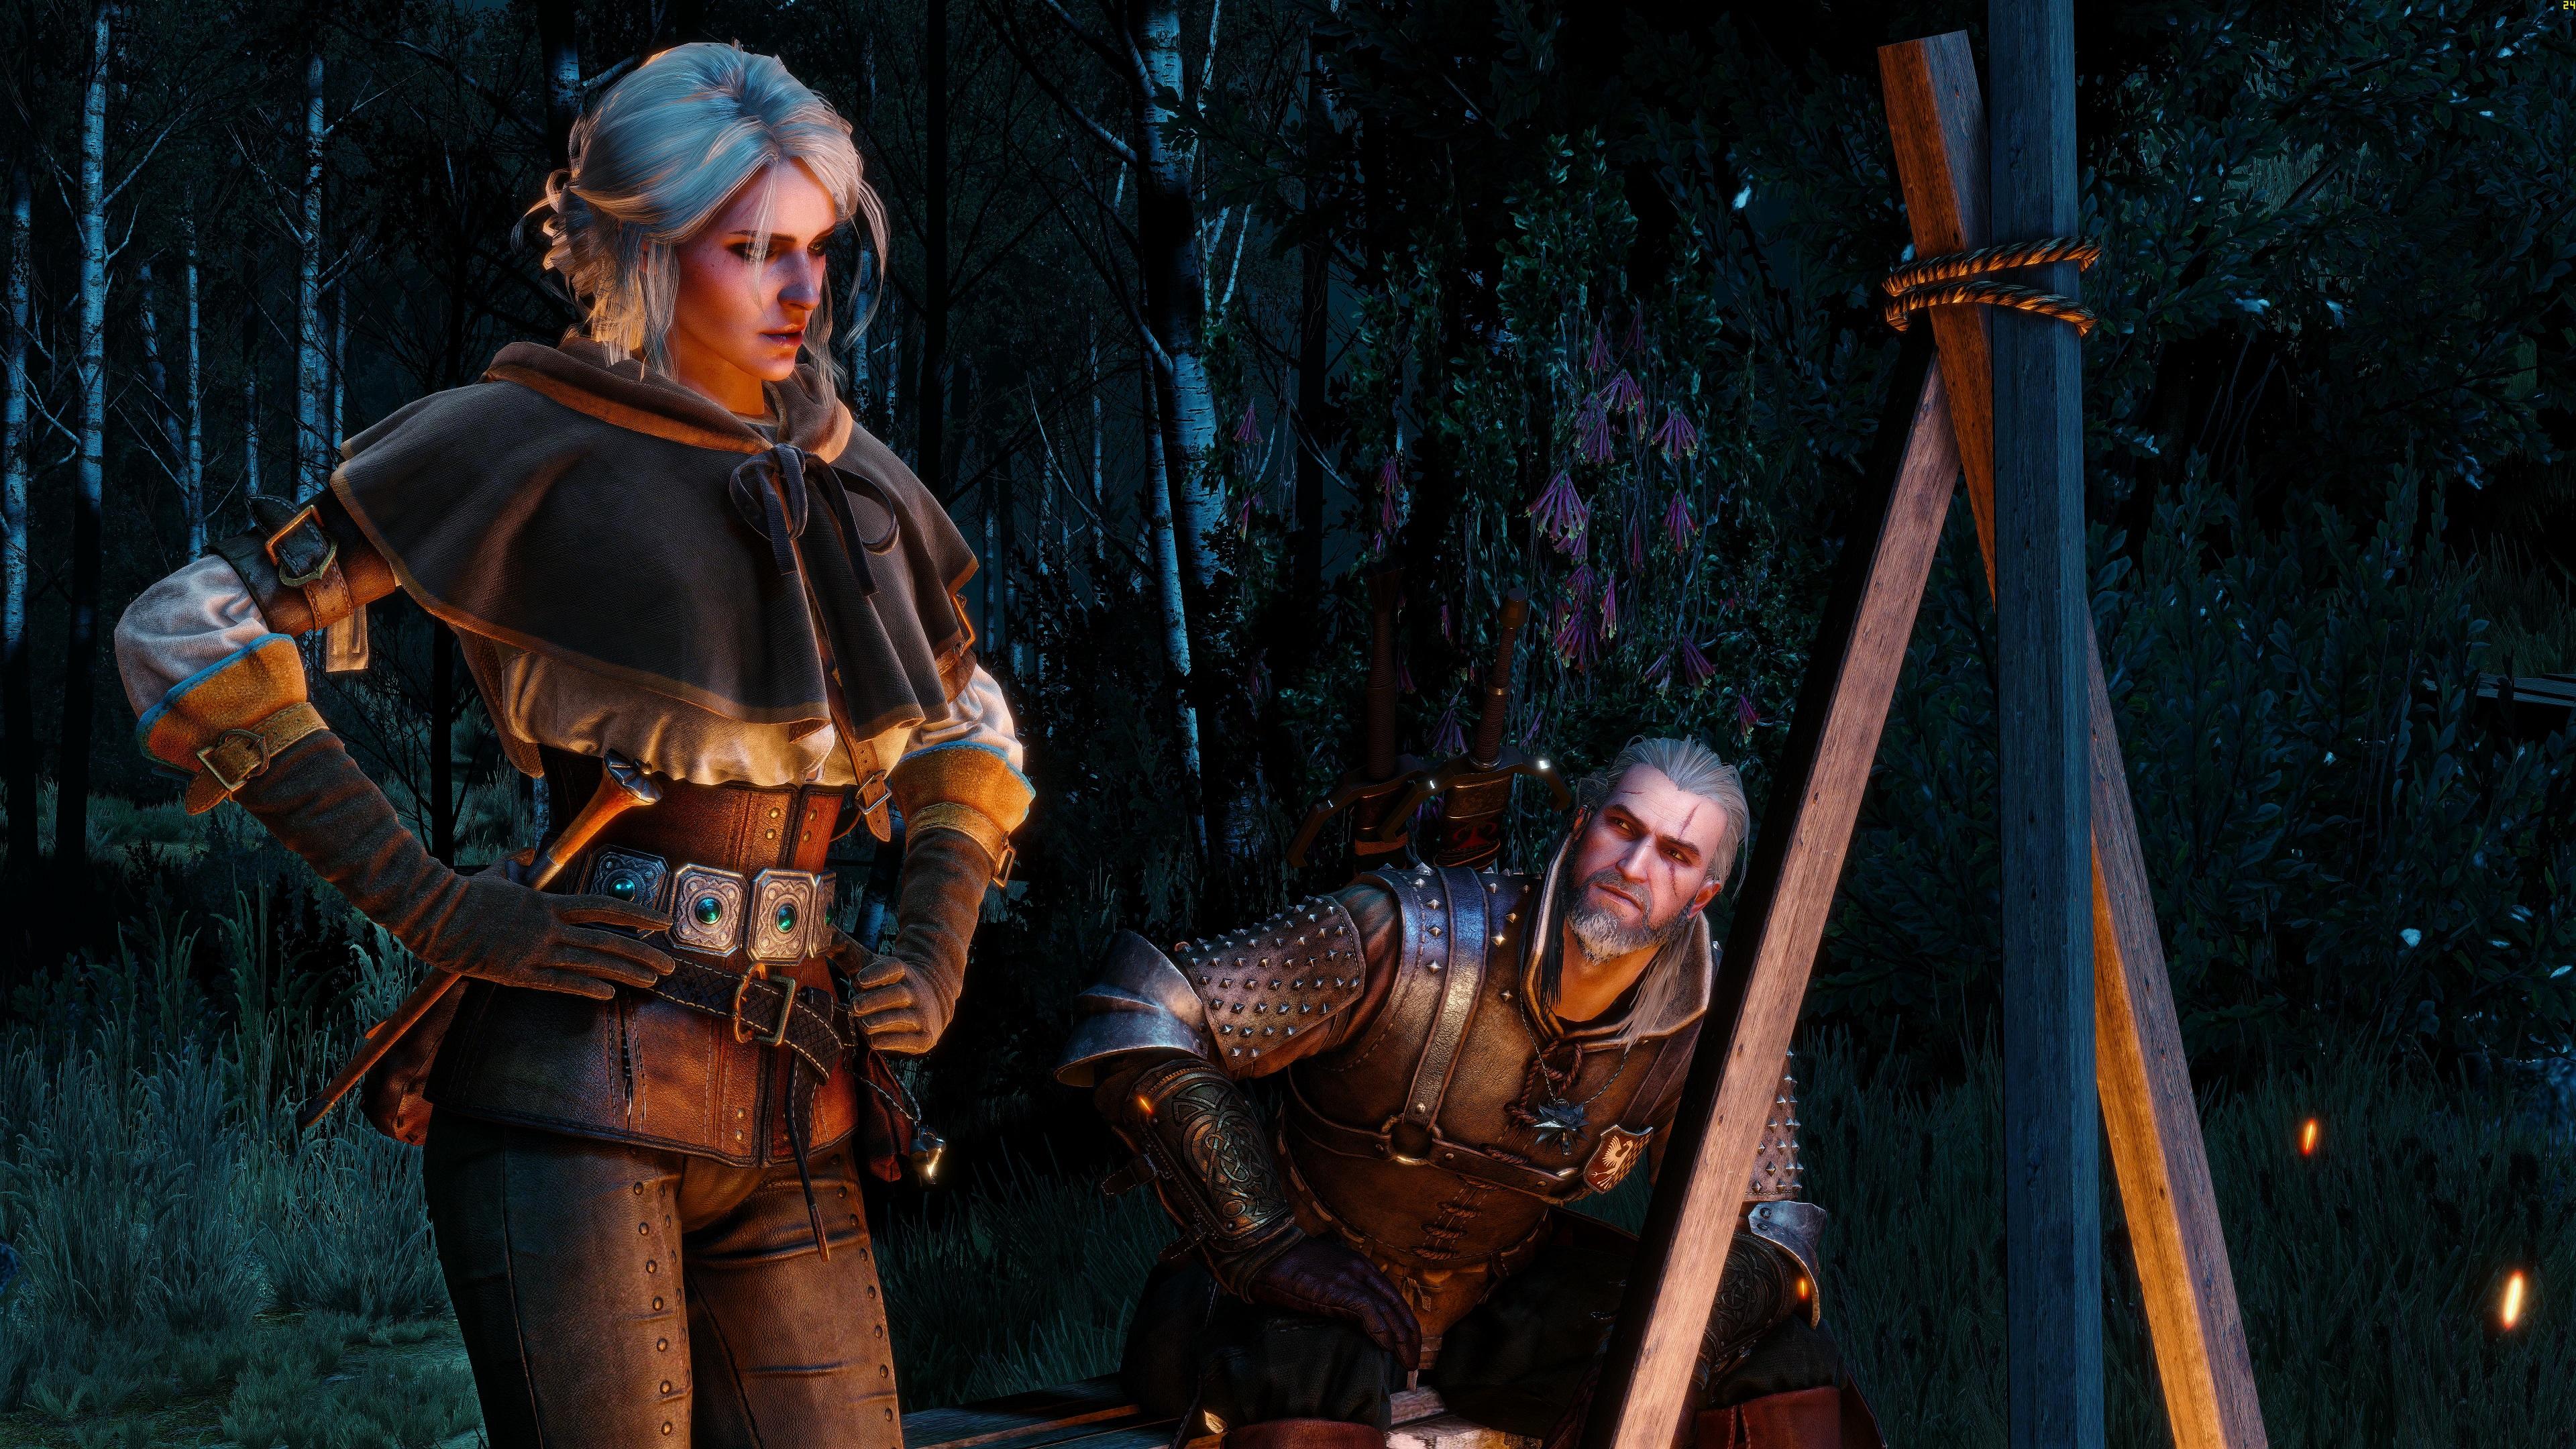 the witcher 3 wild hunt 1581276255 - The Witcher 3 Wild Hunt - The Witcher 3 Wild Hunt game wallpapers 4k, The Witcher 3 Wild Hunt 4k wallpapers